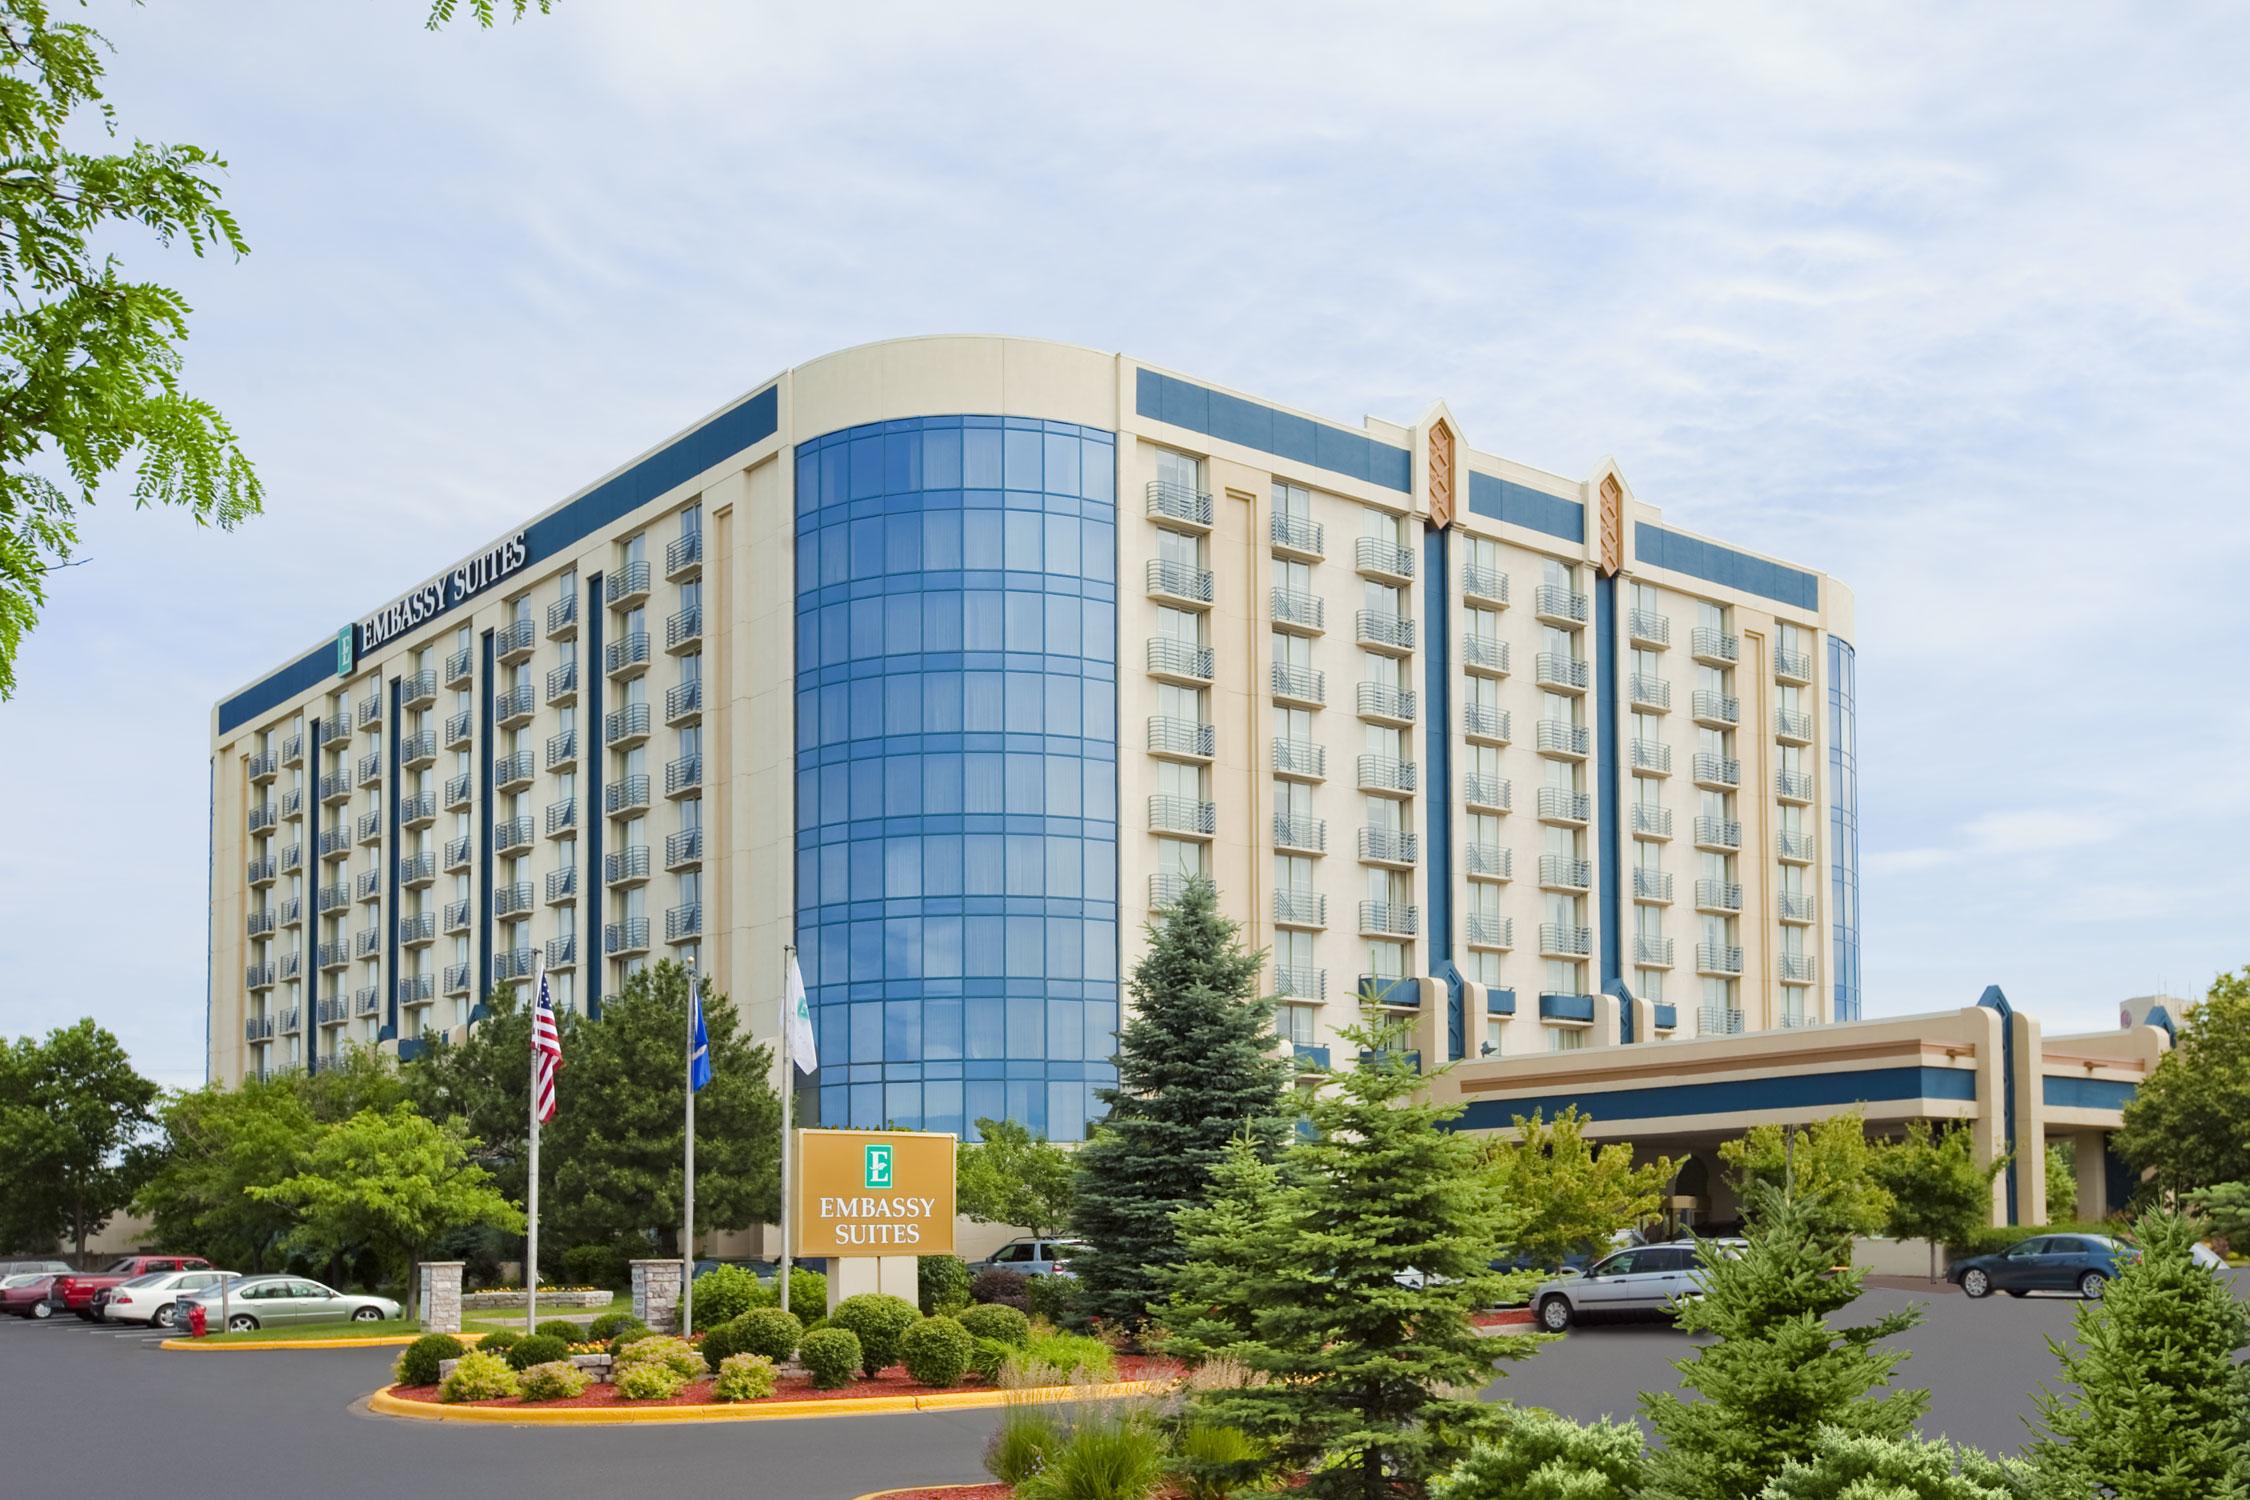 Embassy Suites By Hilton Minneapolis Airport Bloomington Minnesota MN